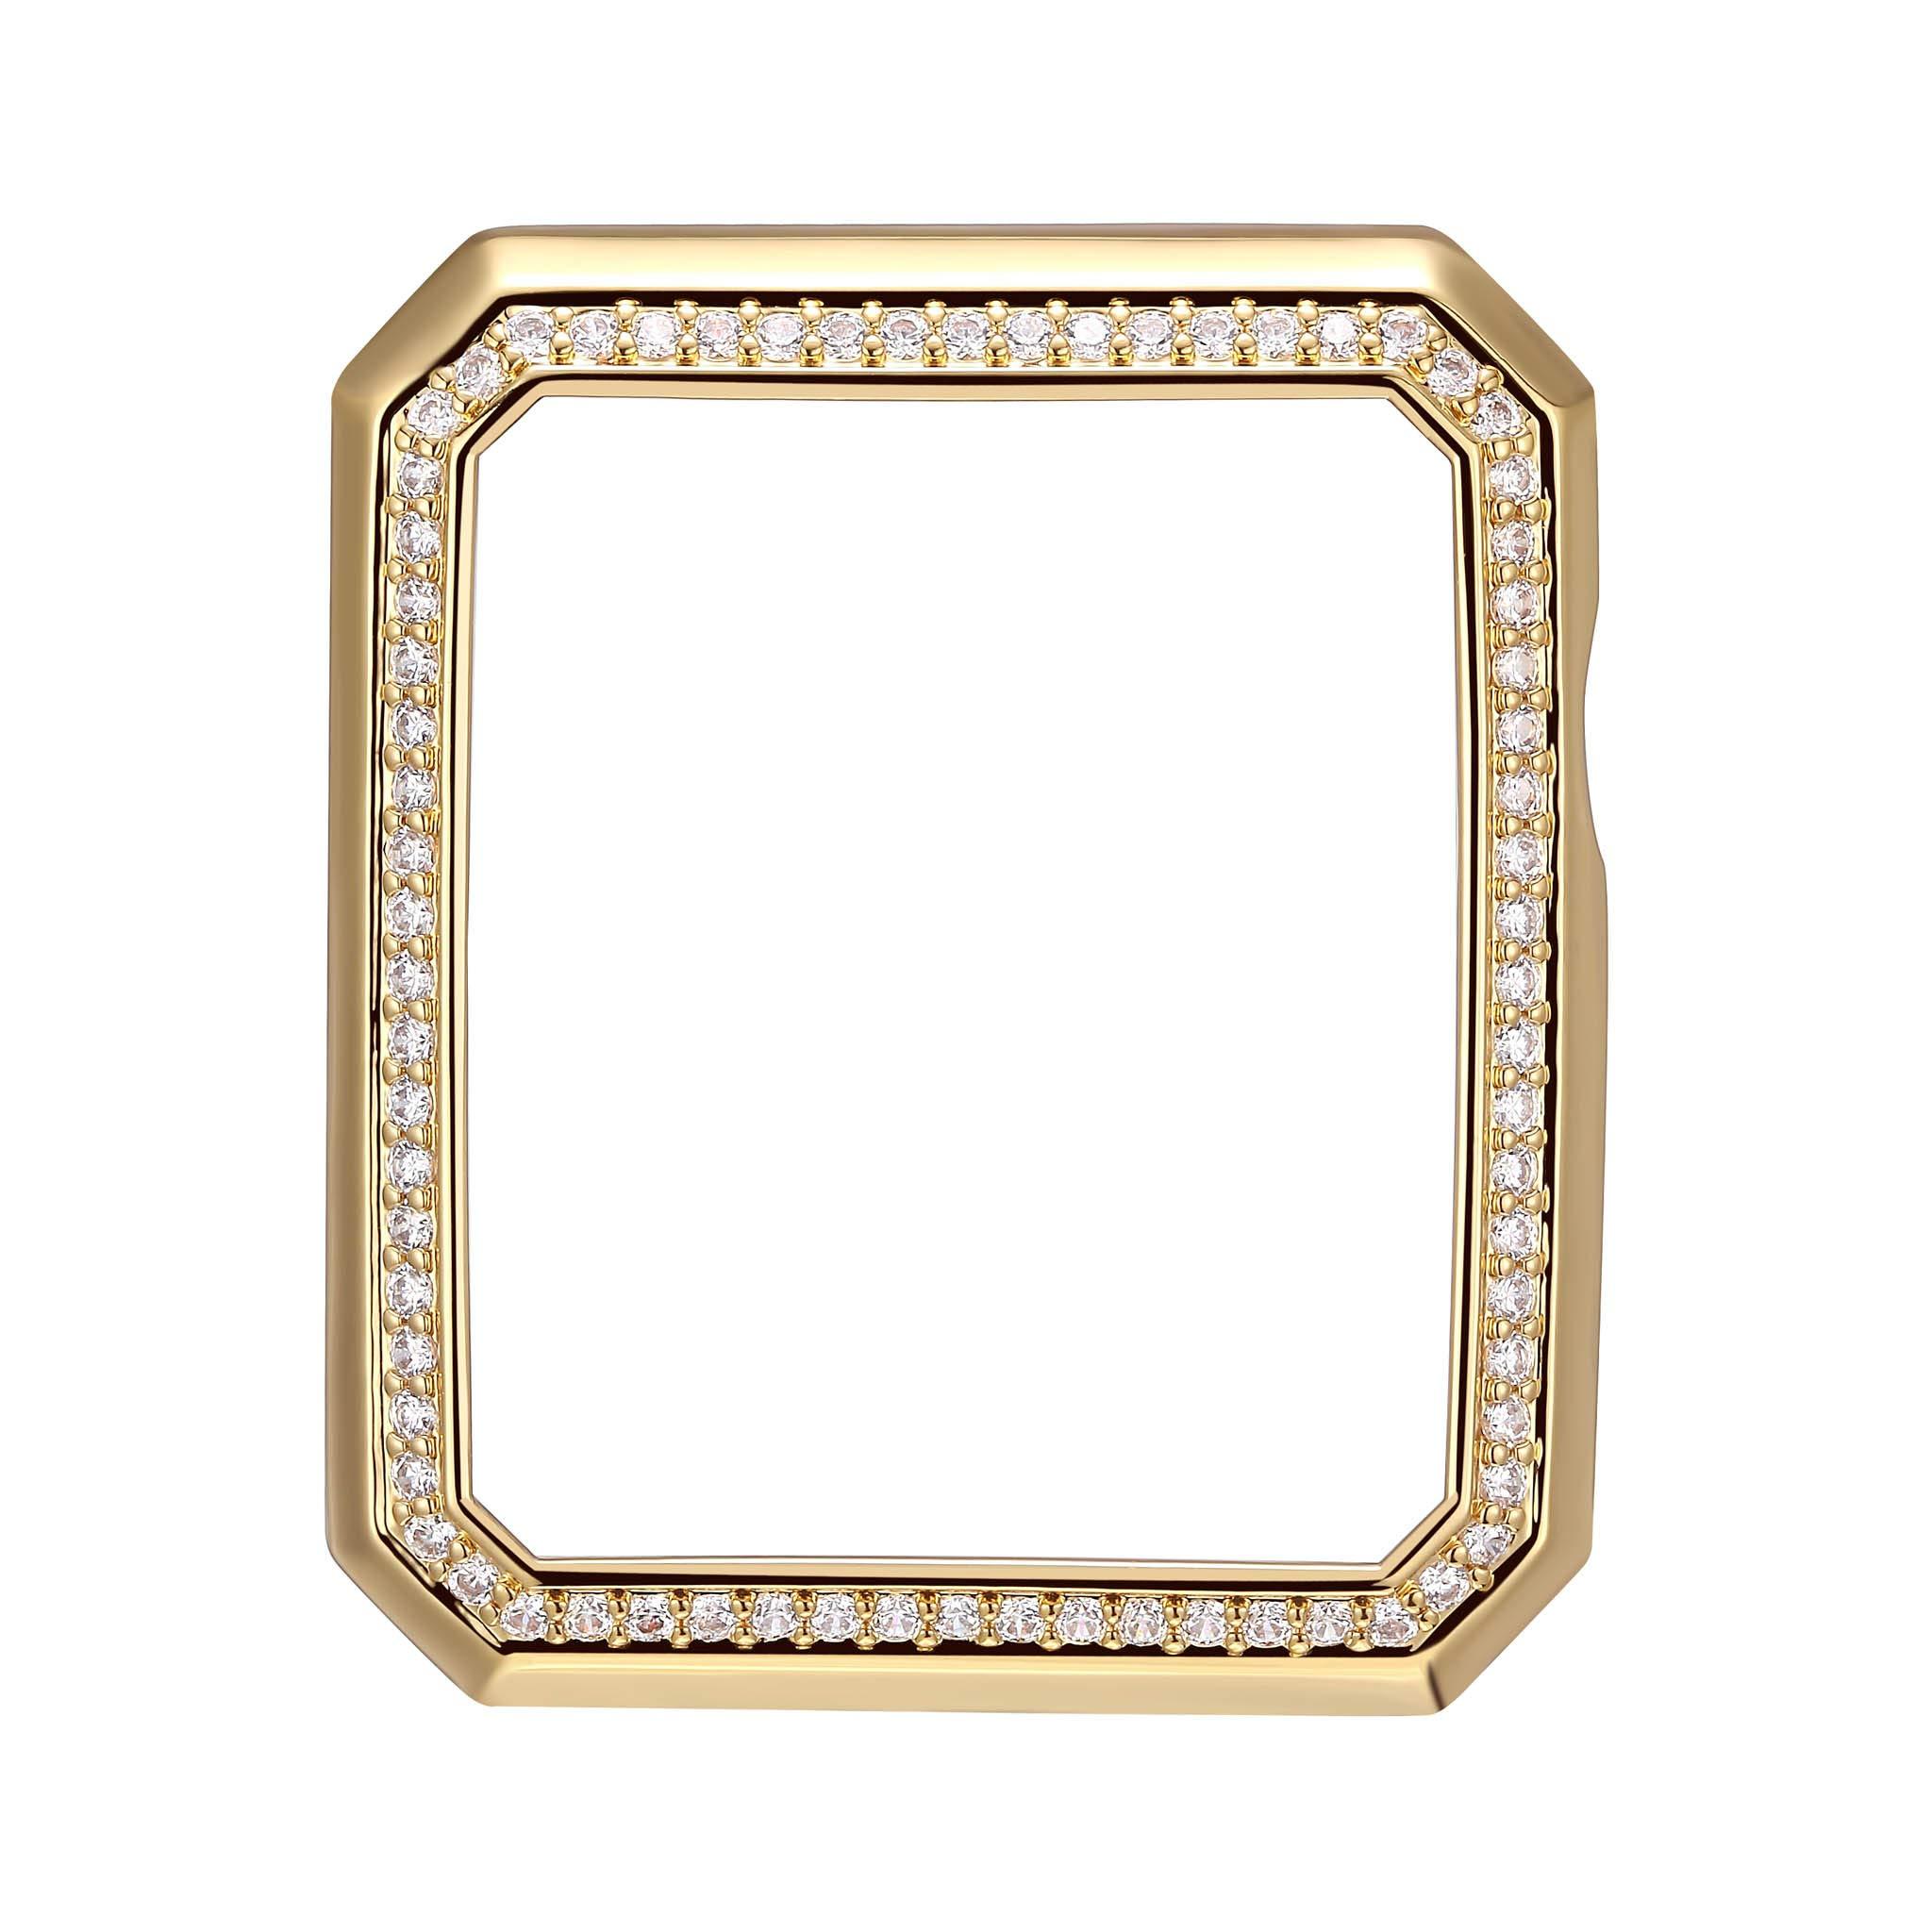 SKYB 18K Yellow Gold Plated Bronze Deco Halo Jewelry-Style Apple Watch Case with Swarovski Zirconia CZ Border - Large (Fits 42mm iWatch)